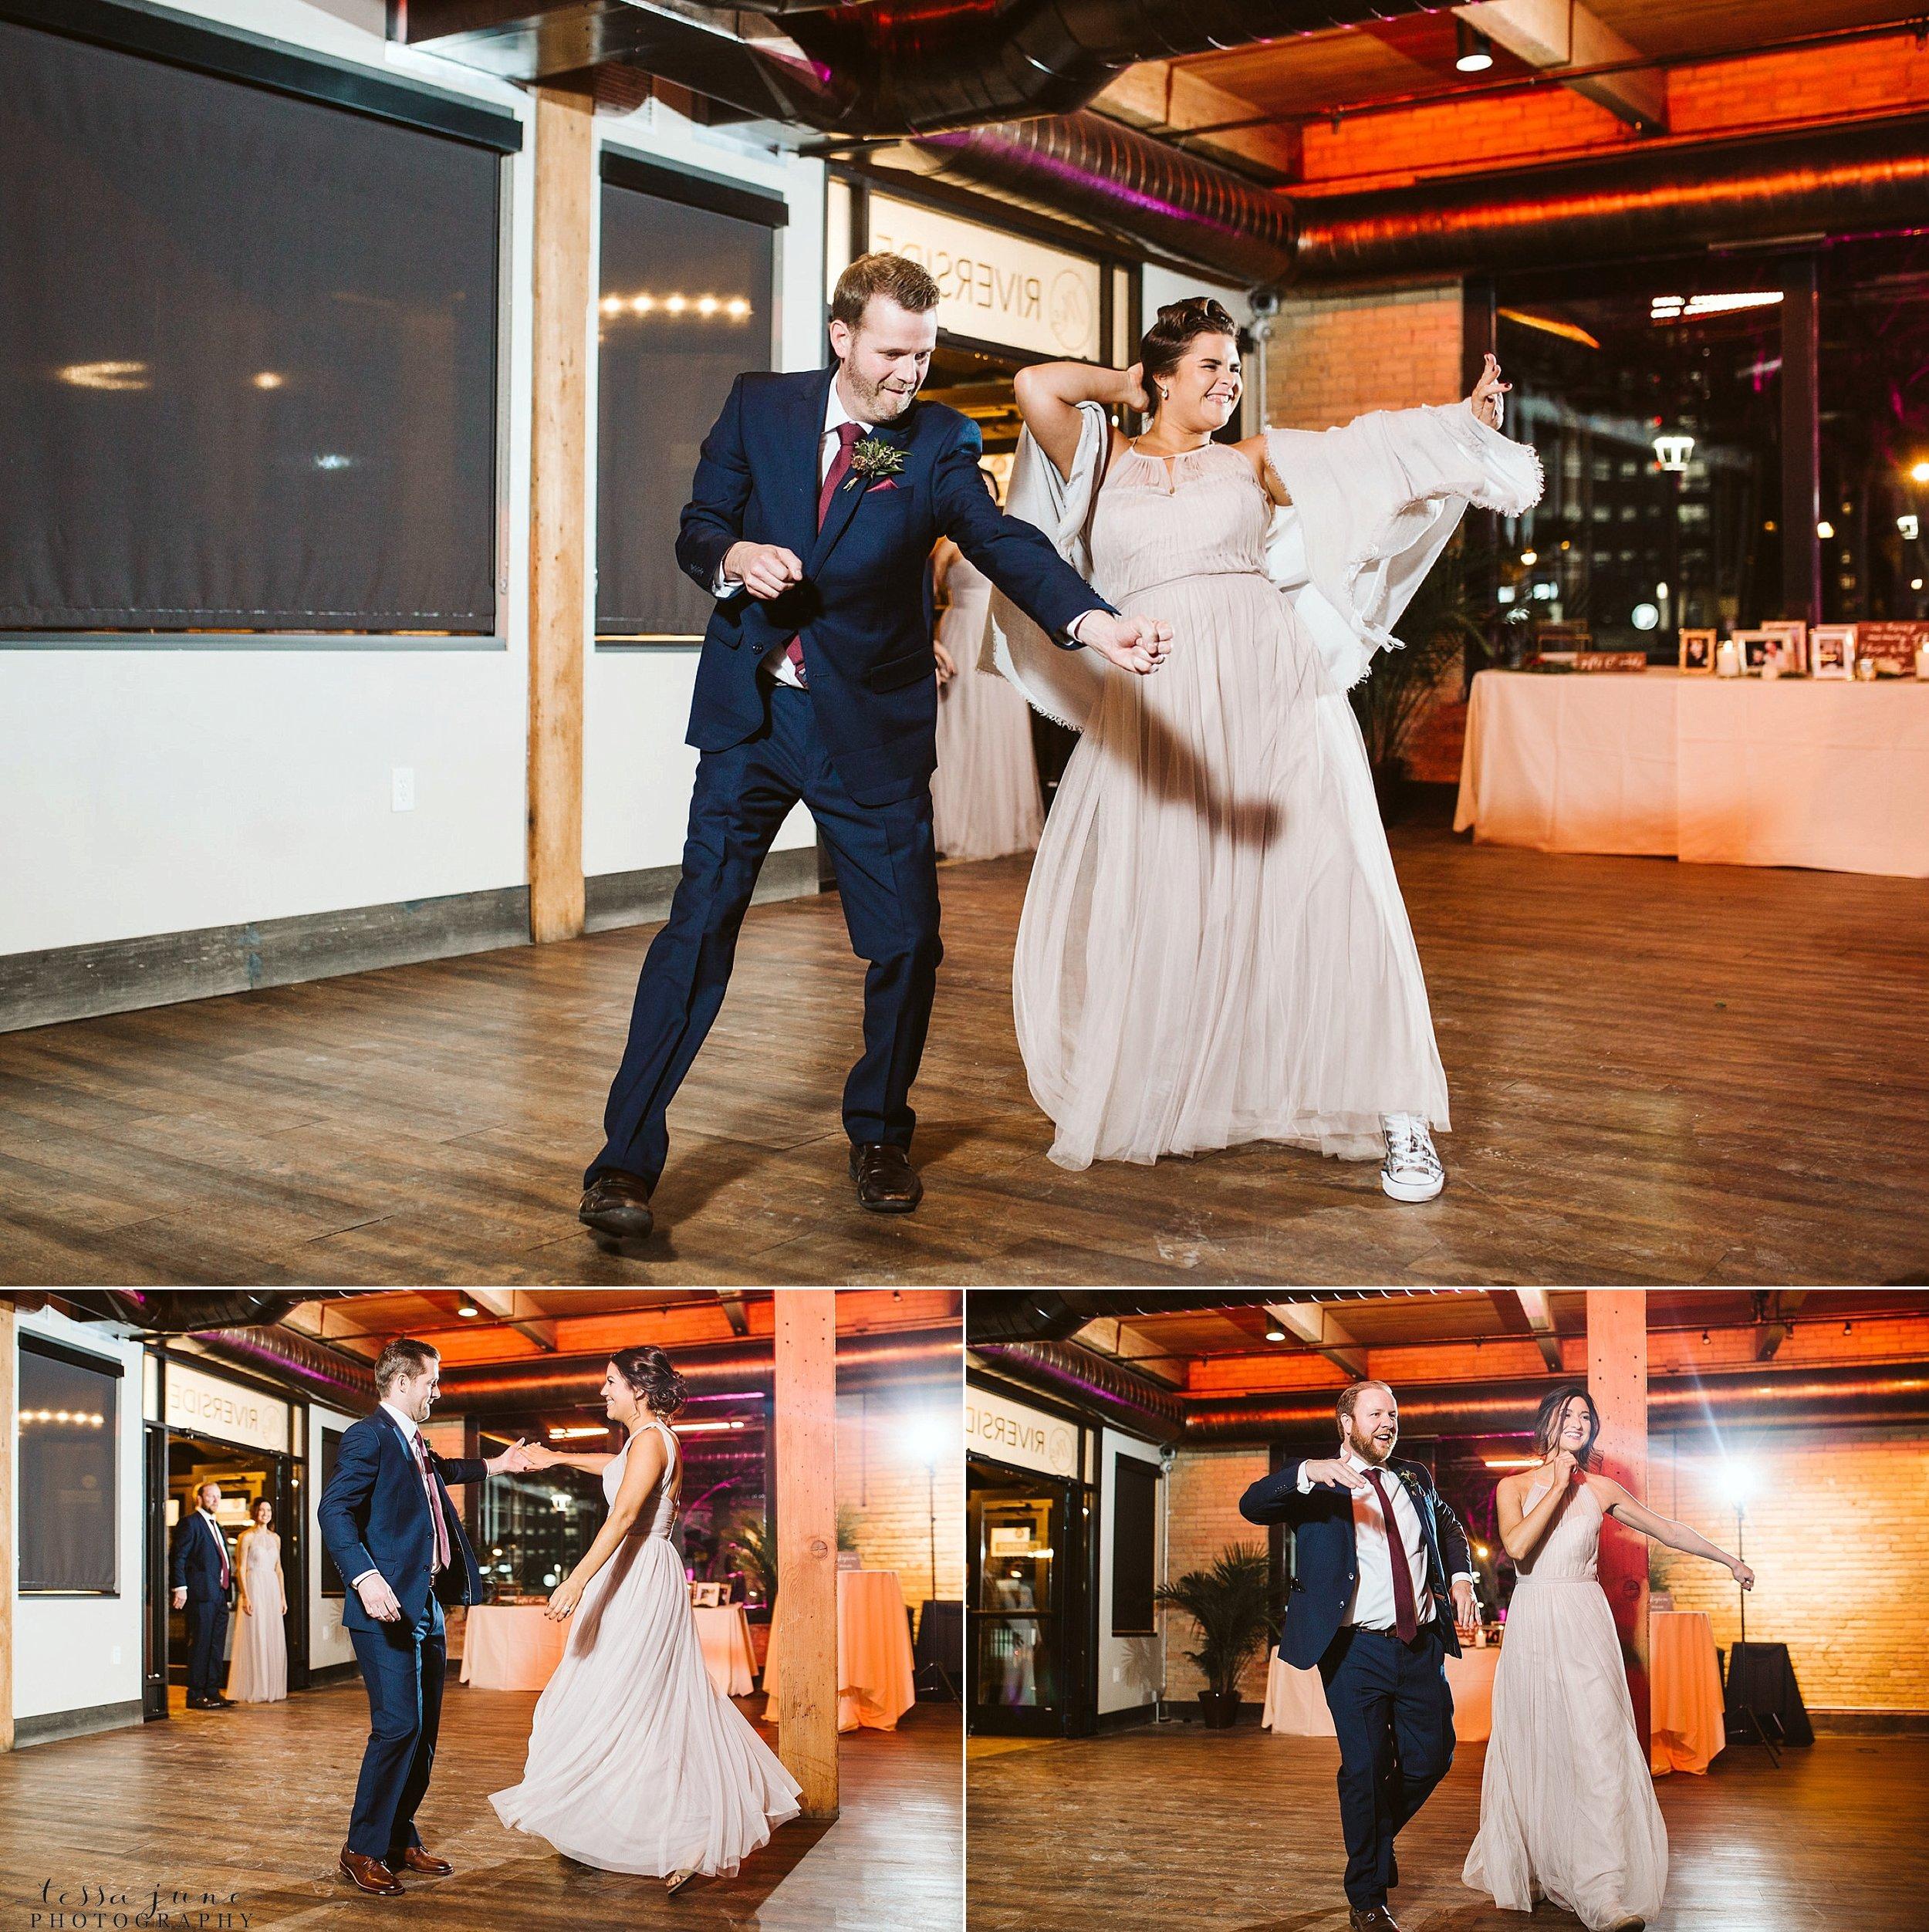 minneapolis-event-center-winter-romantic-snow-wedding-december-173.jpg